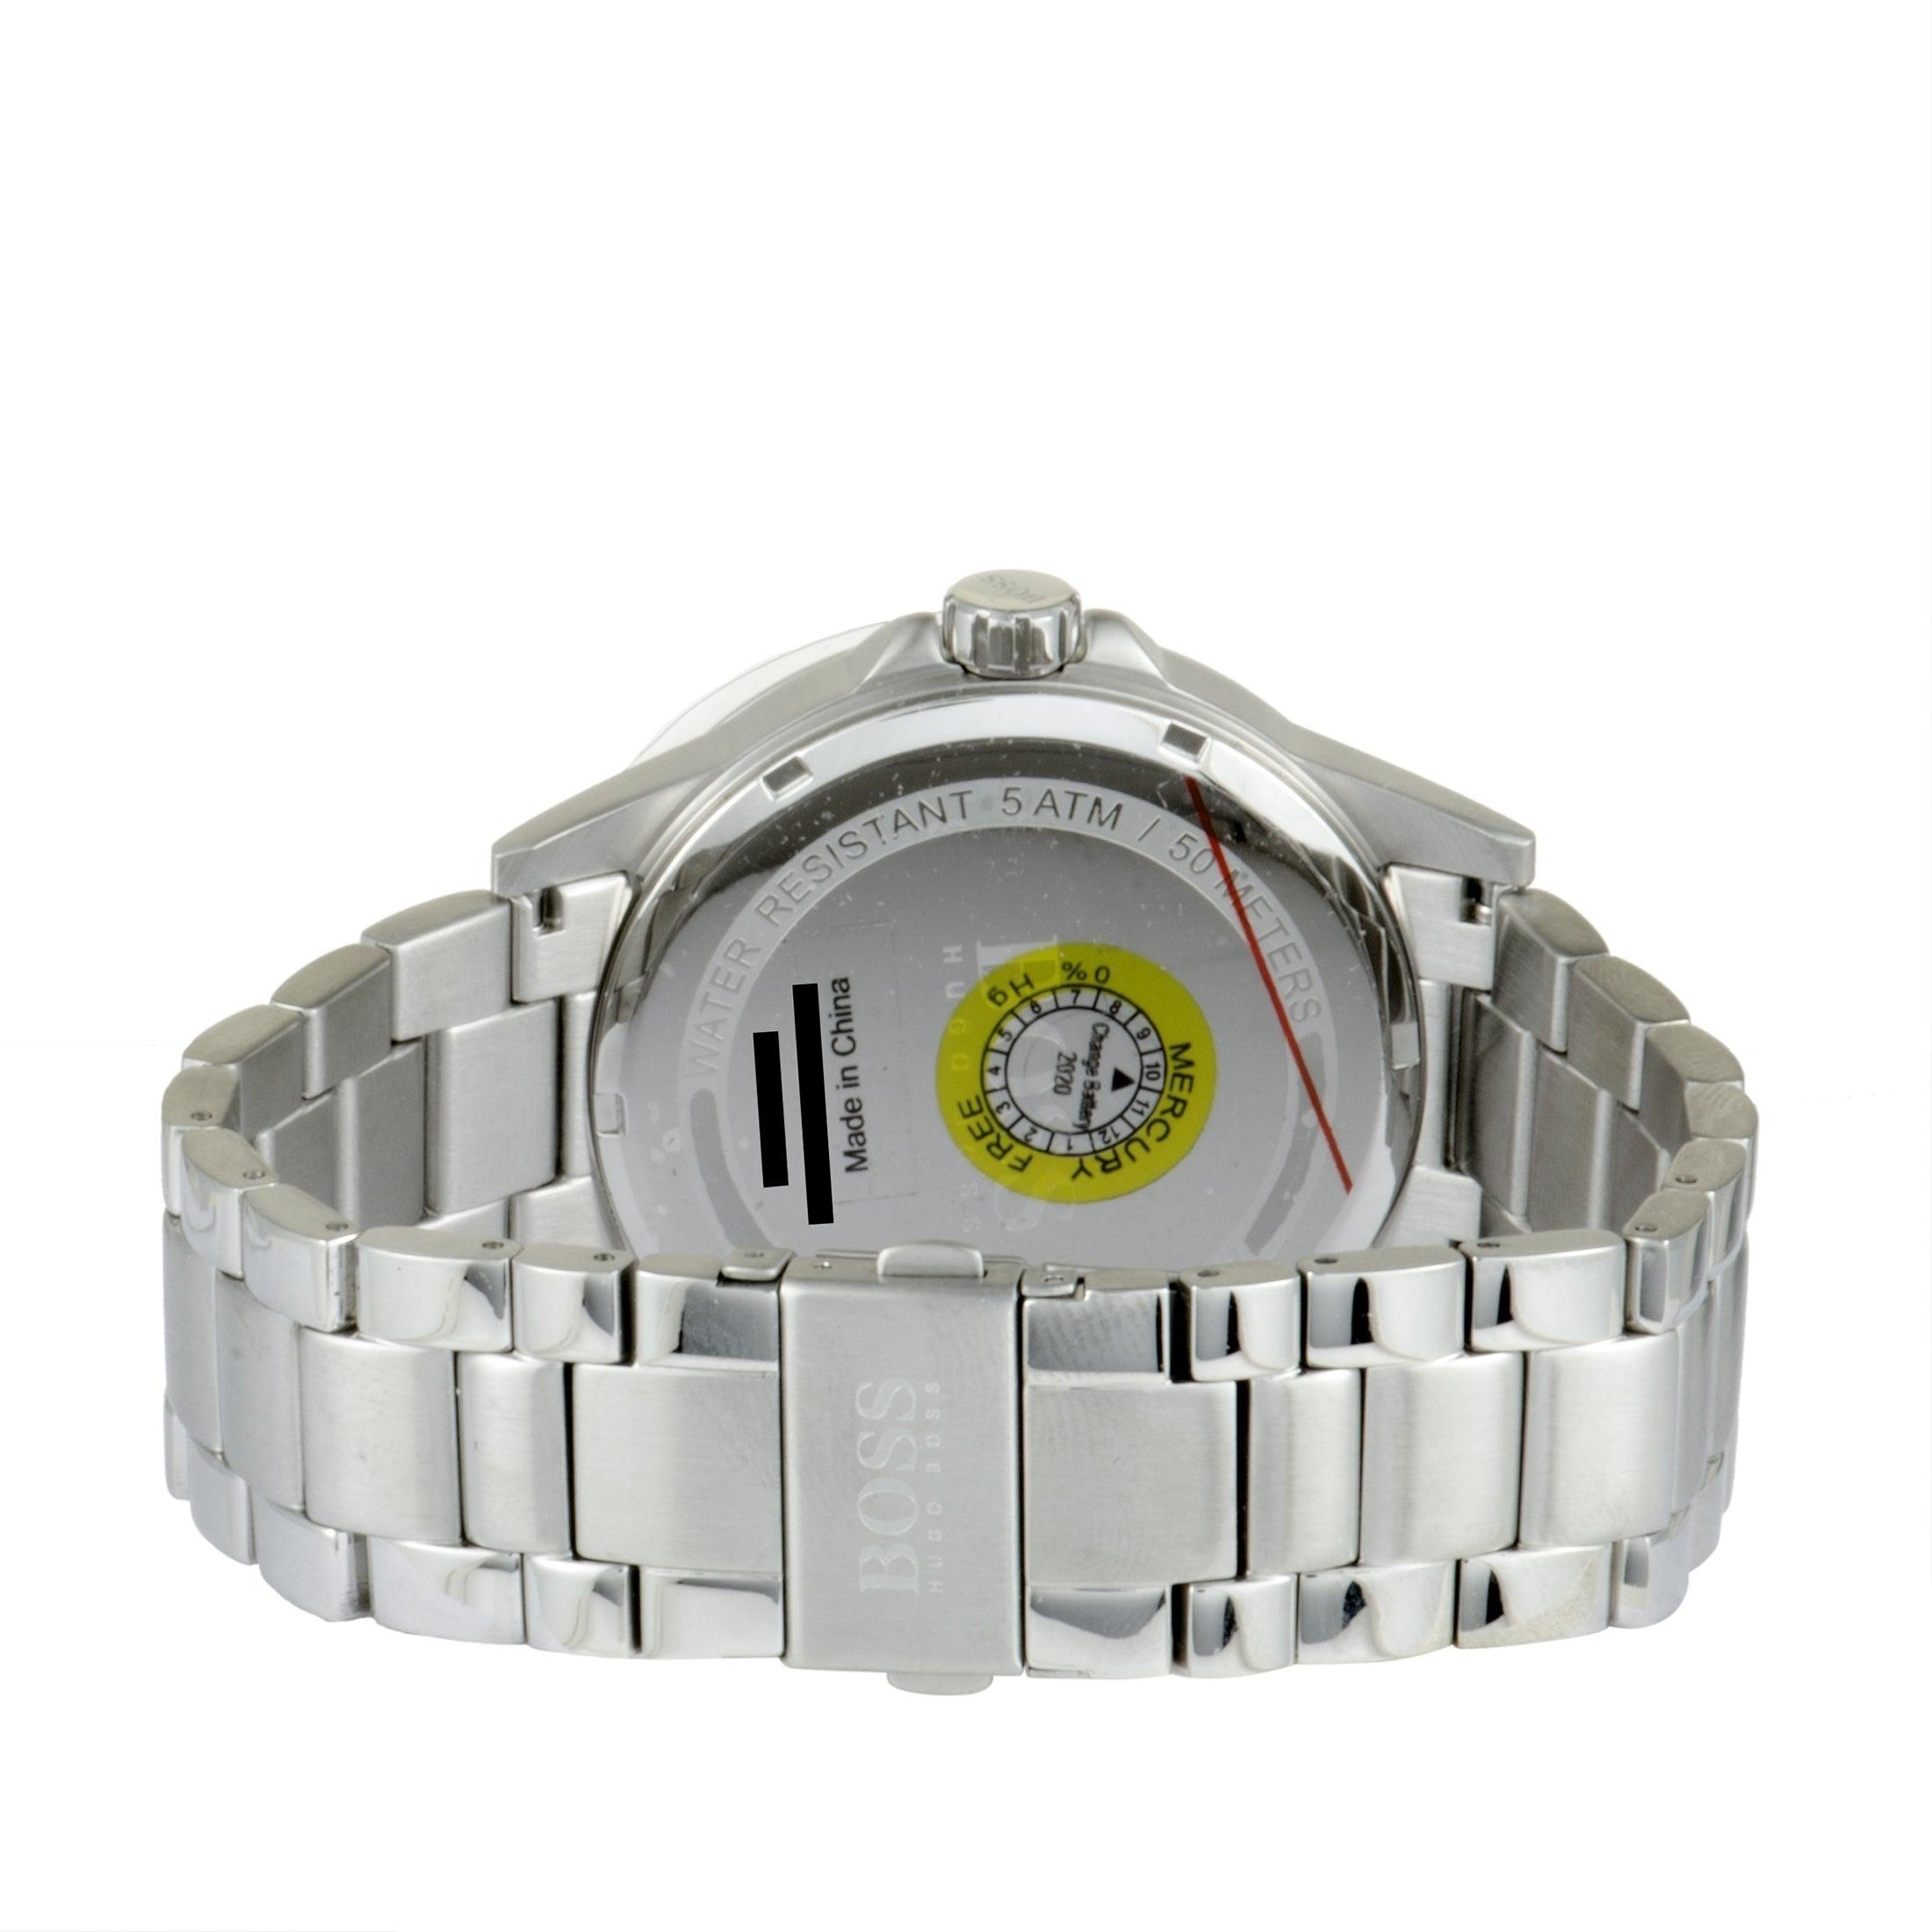 c50db463f Shop Hugo Boss Aviator Casual Sport Men's Watch Black 1513518 - On Sale -  Ships To Canada - Overstock - 26959848